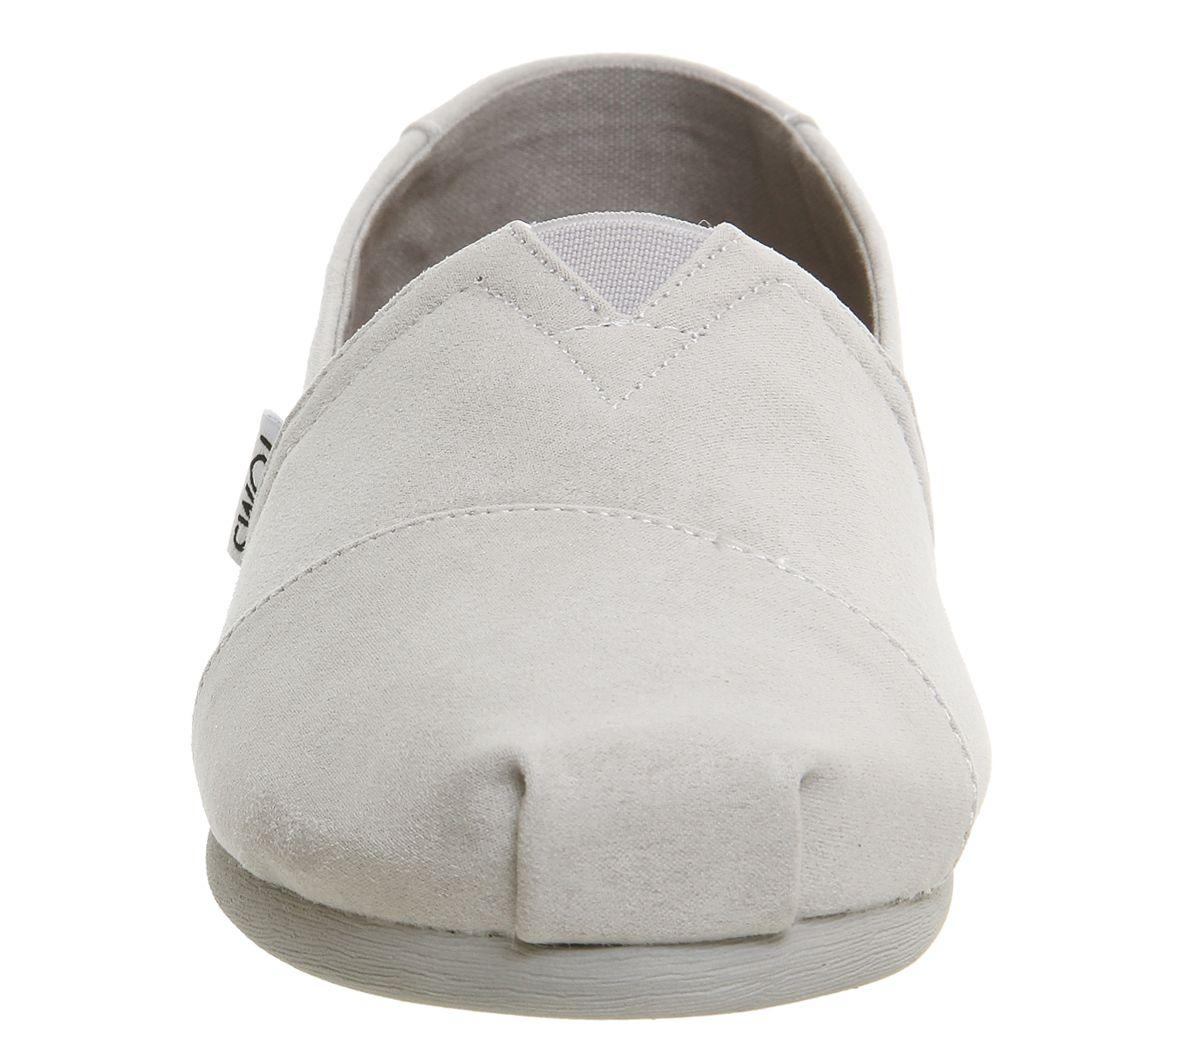 Womens-Toms-Seasonal-Classic-Slip-On-Drizzle-Grey-Flats thumbnail 9